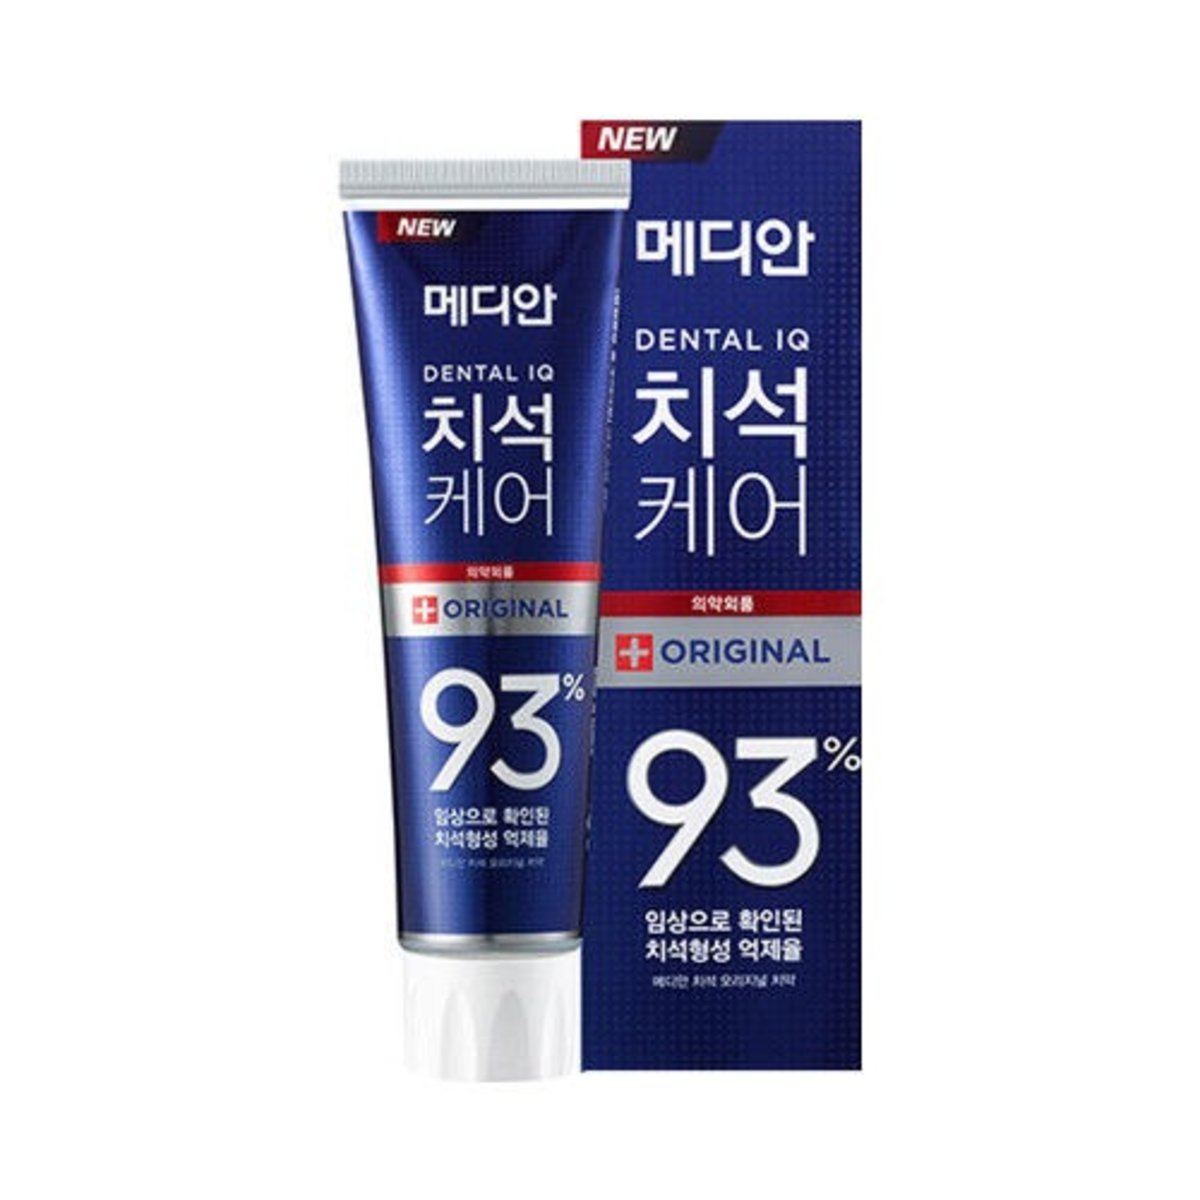 Median - 牙石護理93 原味牙膏 (藍色) 120g (此為平行進口產品)    [Parallel Import Product]